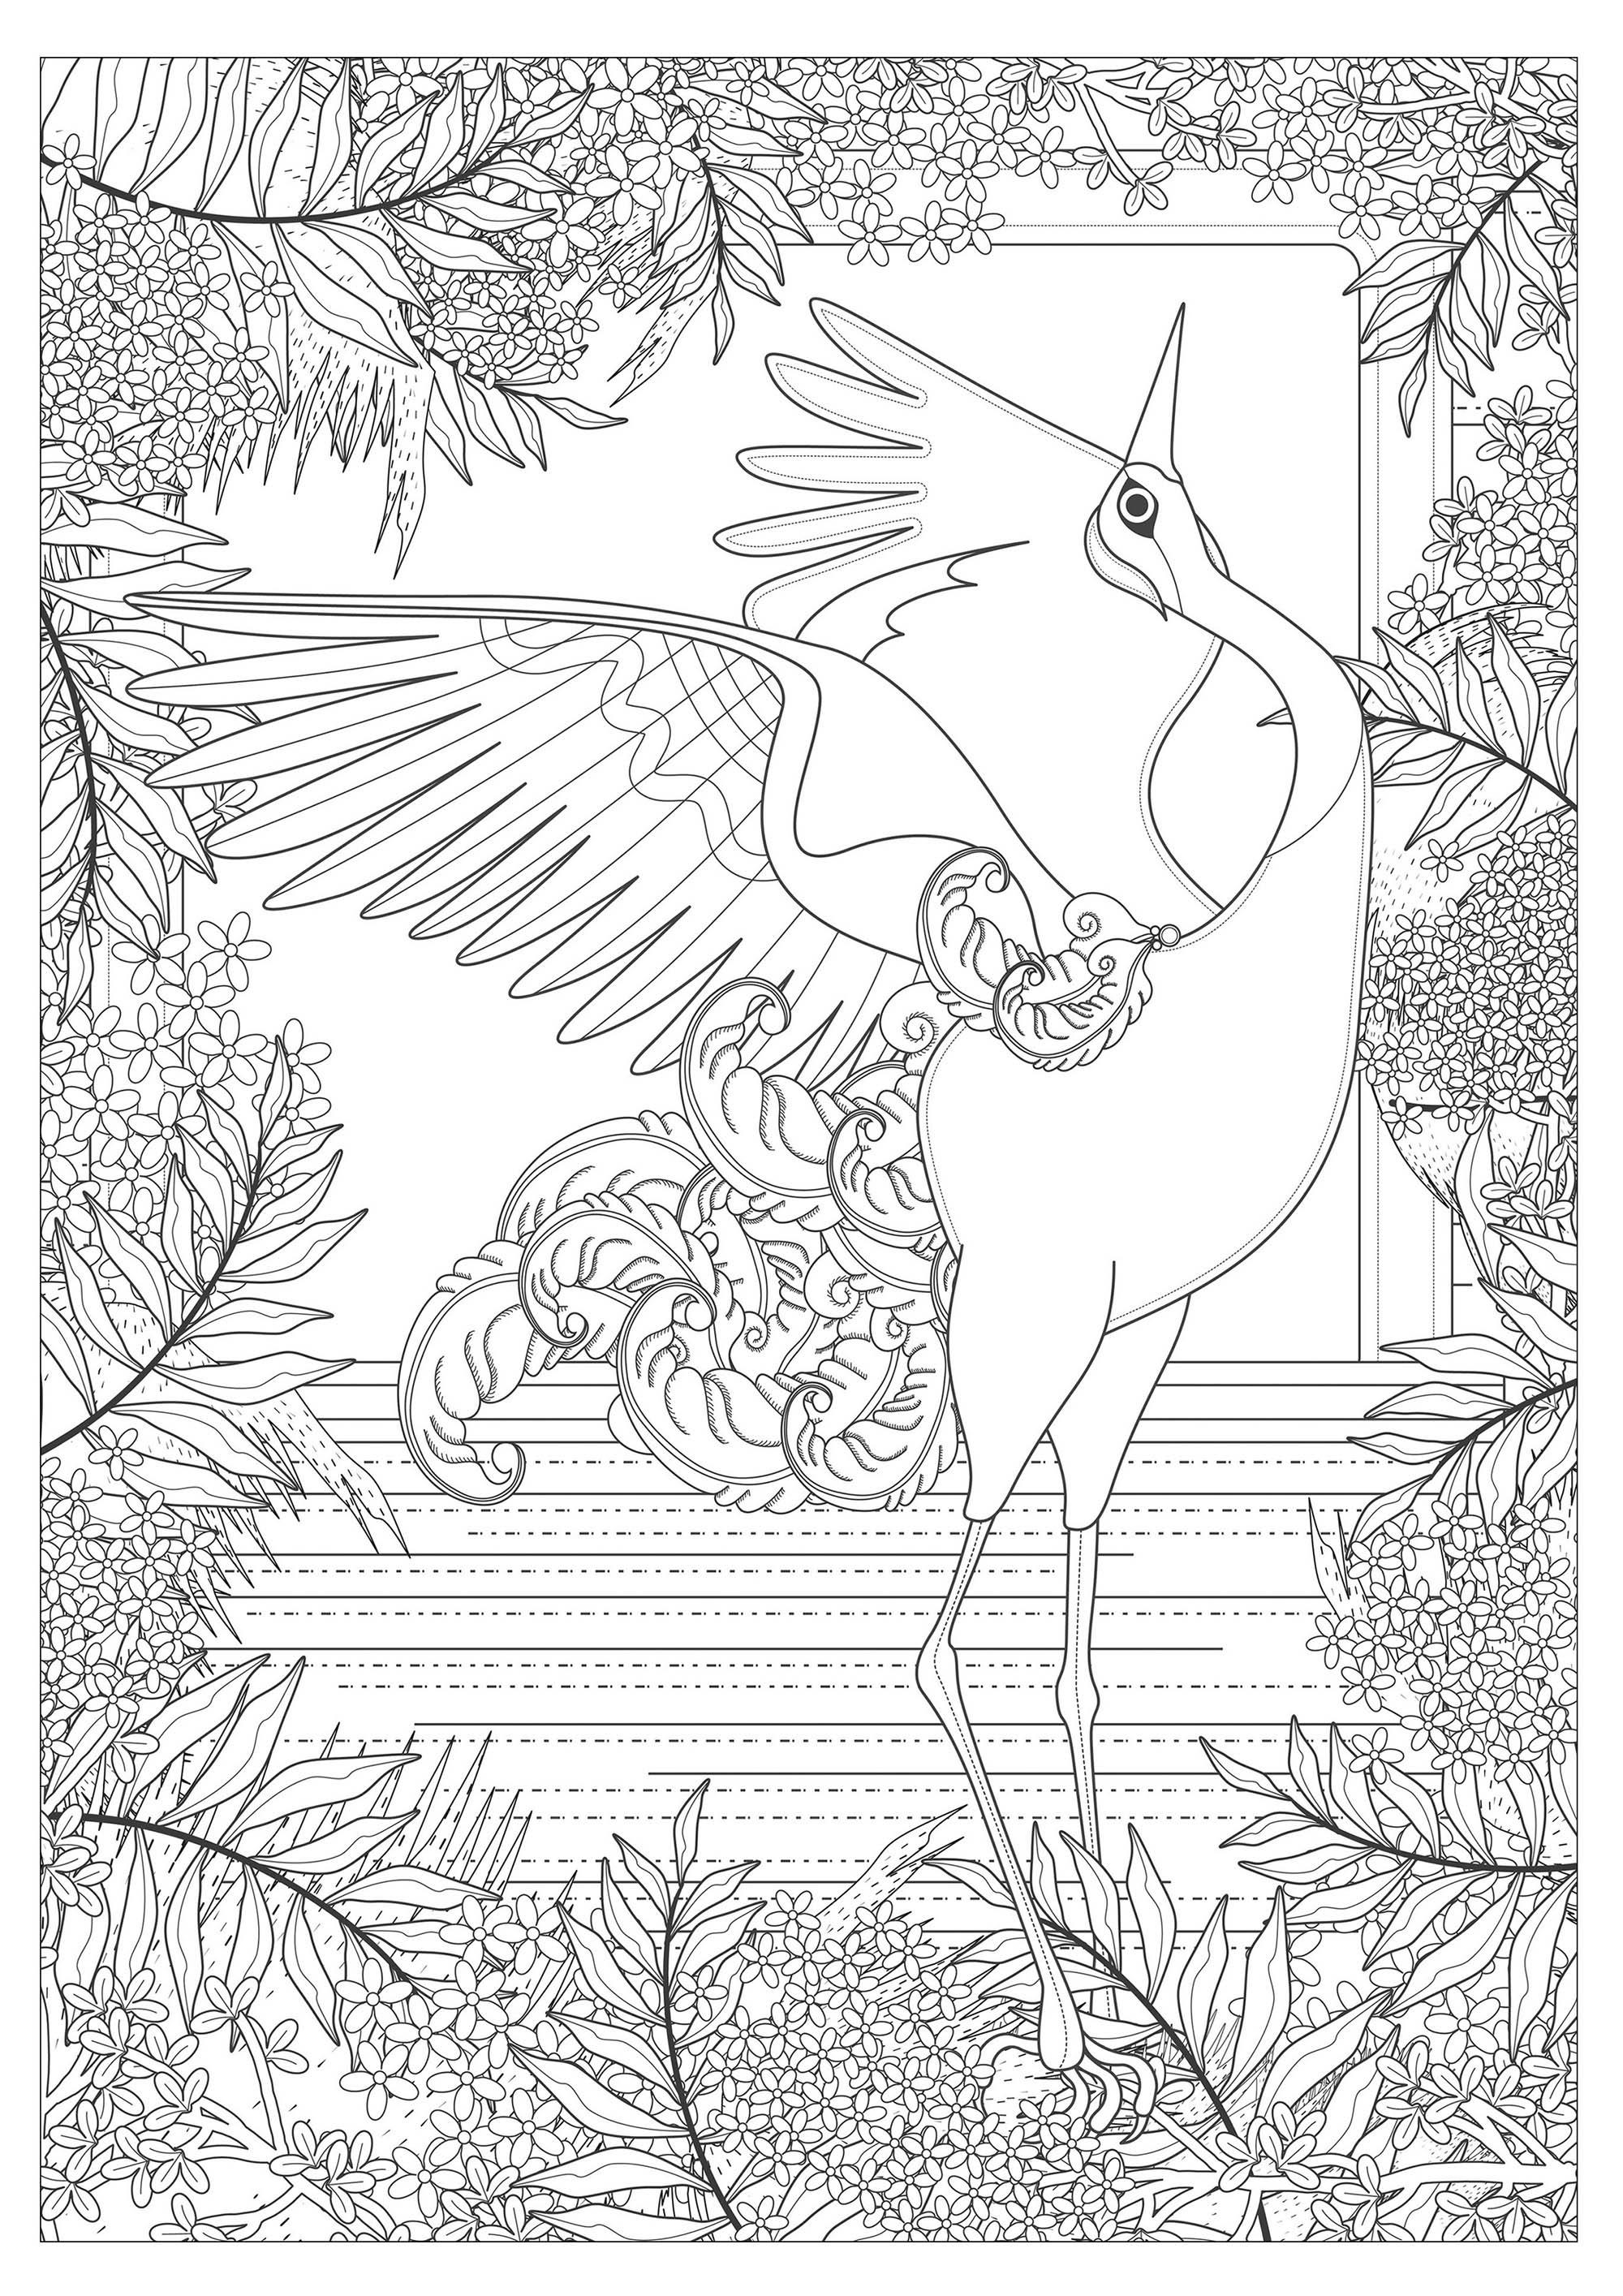 Malbuch Fur Erwachsene  : Vögel - 28